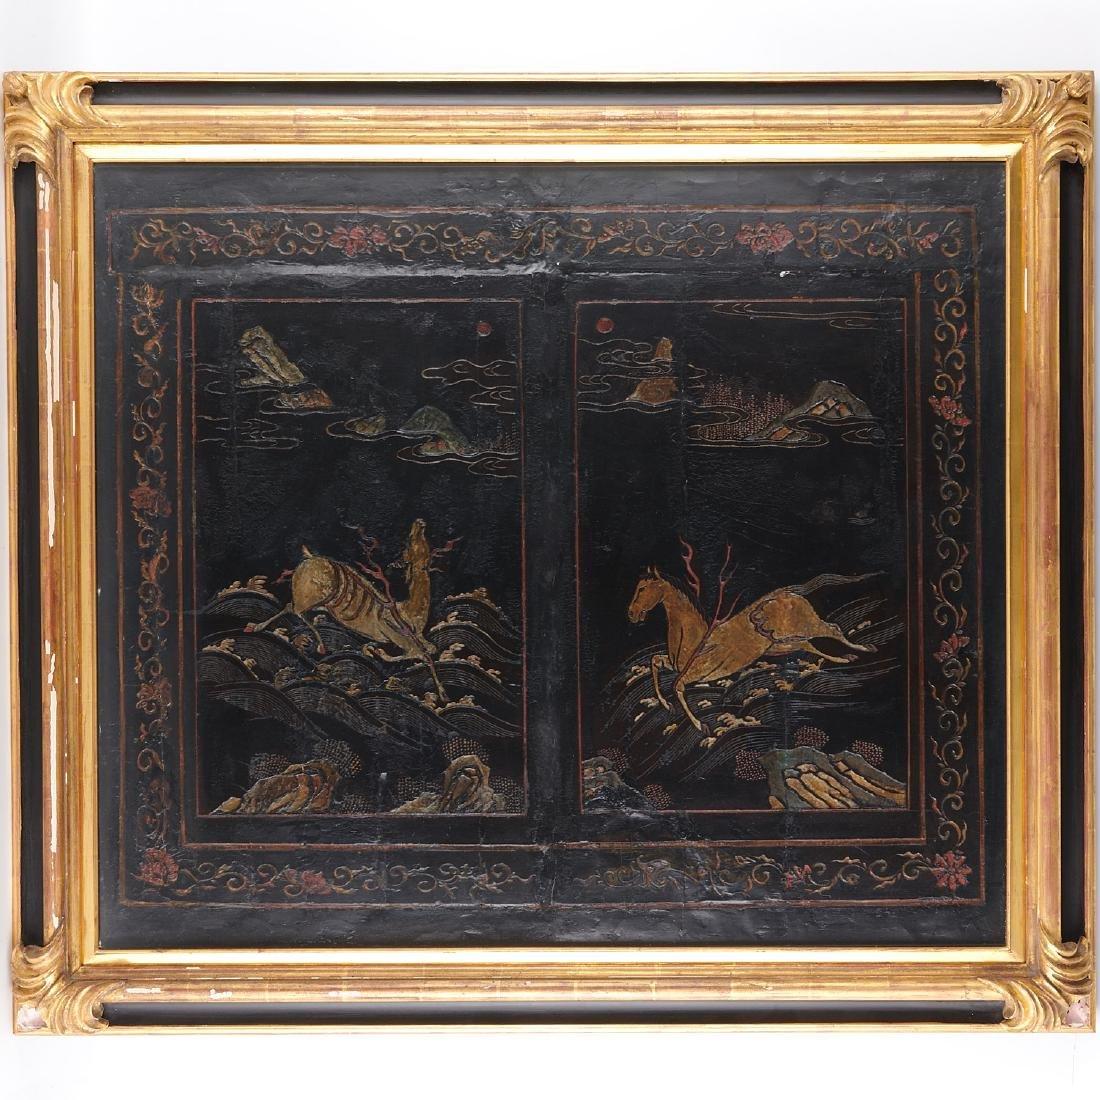 Early Chinese framed coromandel panel